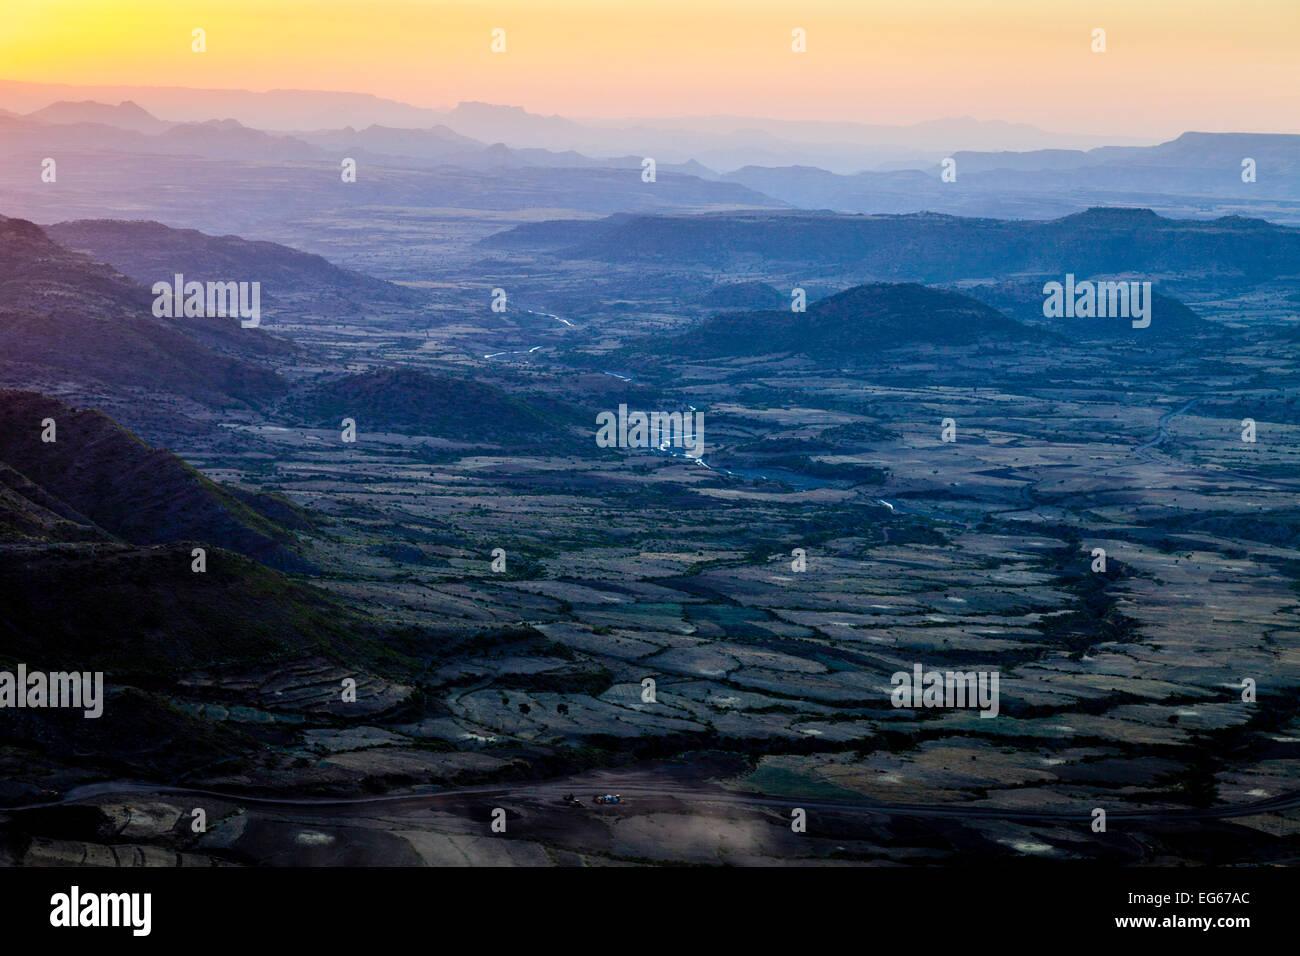 The Scenery Surrounding The Town Of Lalibela, Ethiopia - Stock Image